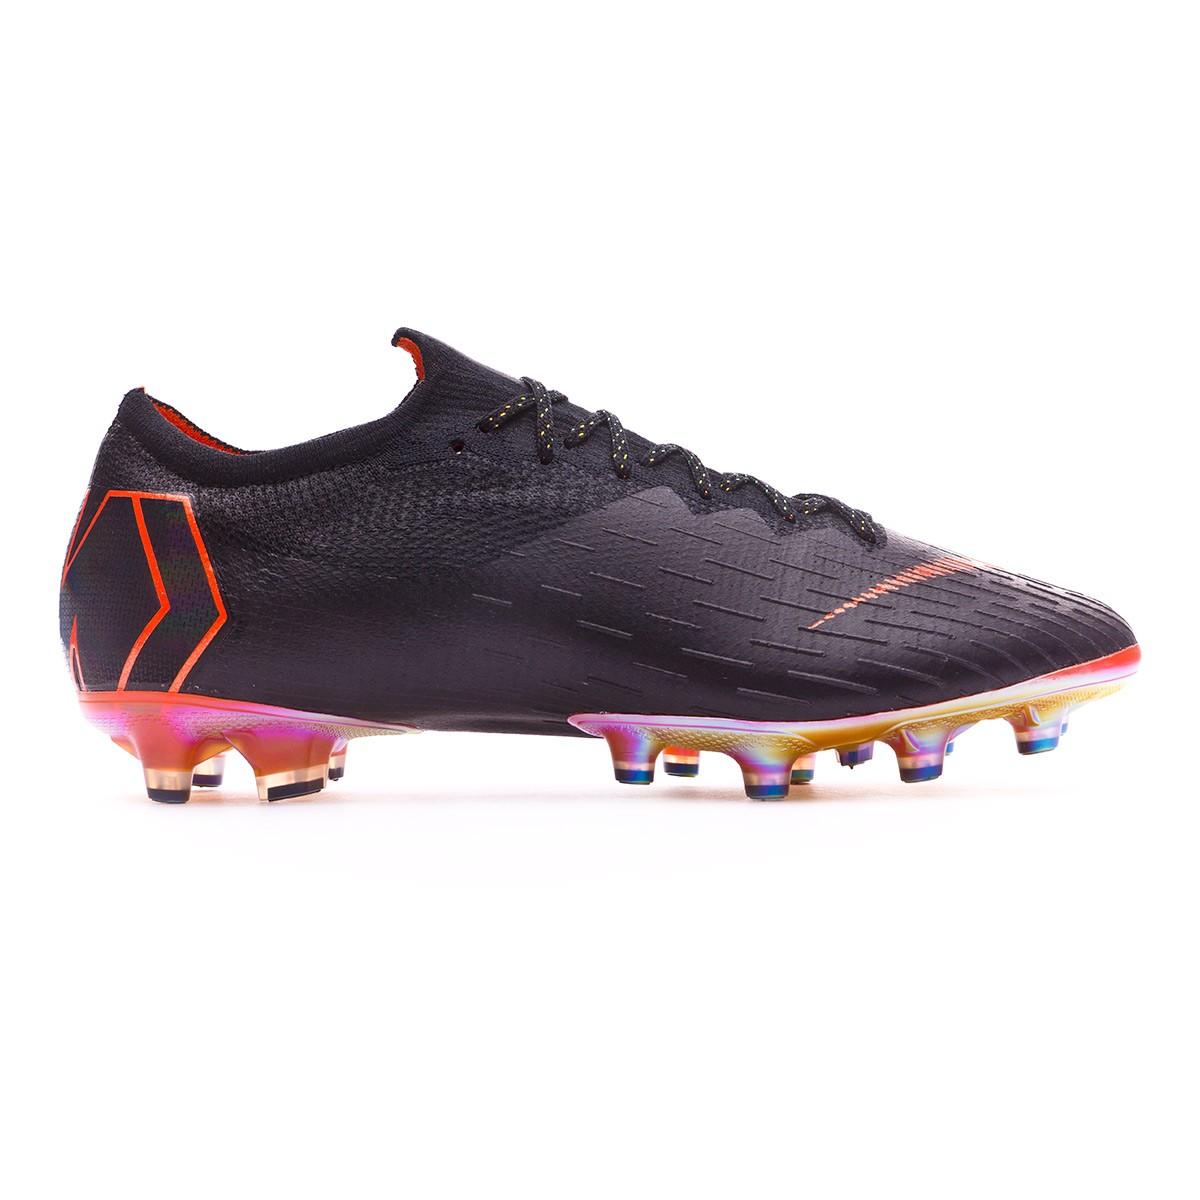 b293a318dce Football Boots Nike Mercurial Vapor XII Elite AG-Pro Black-Total  orange-White - Football store Fútbol Emotion